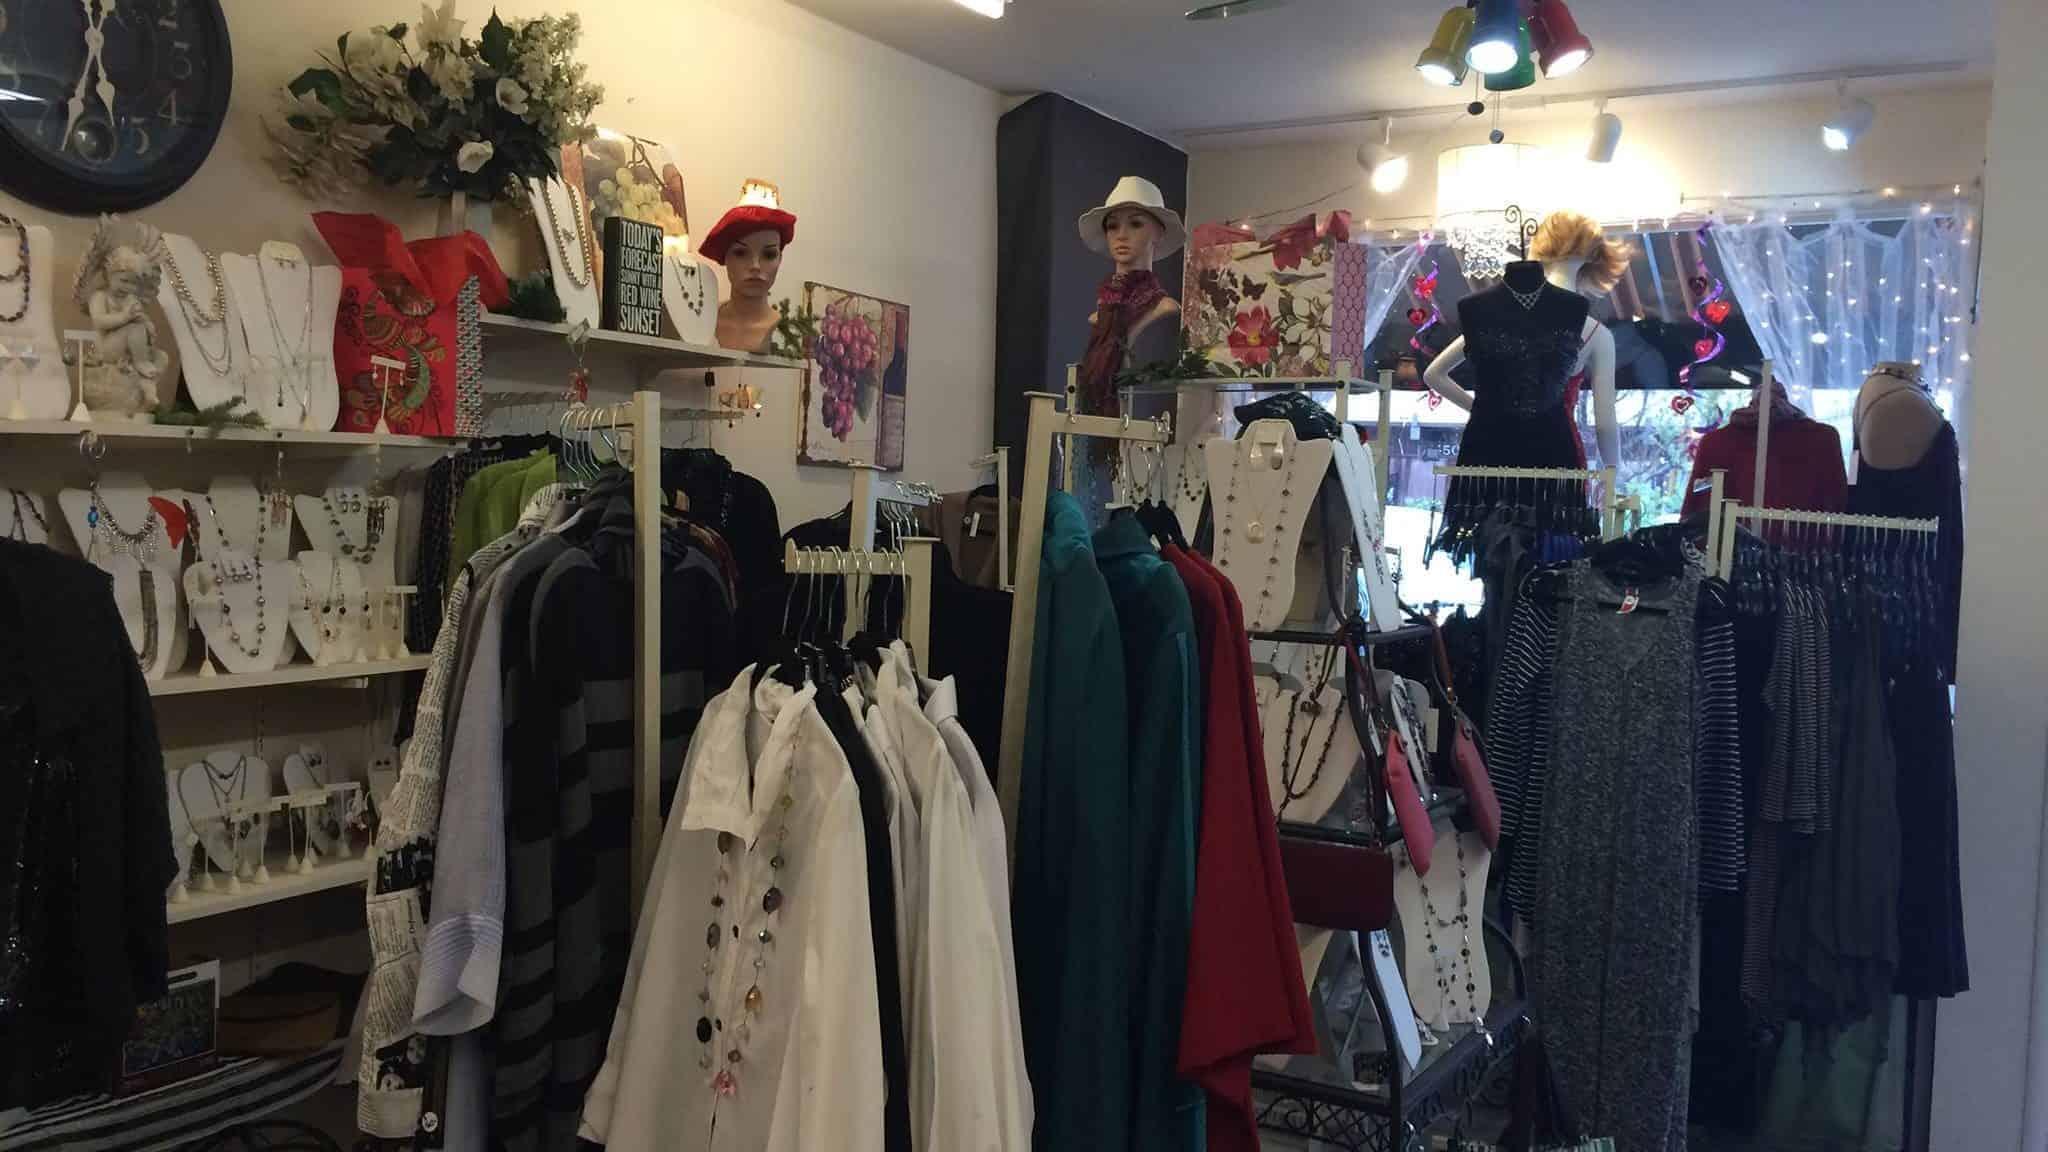 North Star Gift Shop